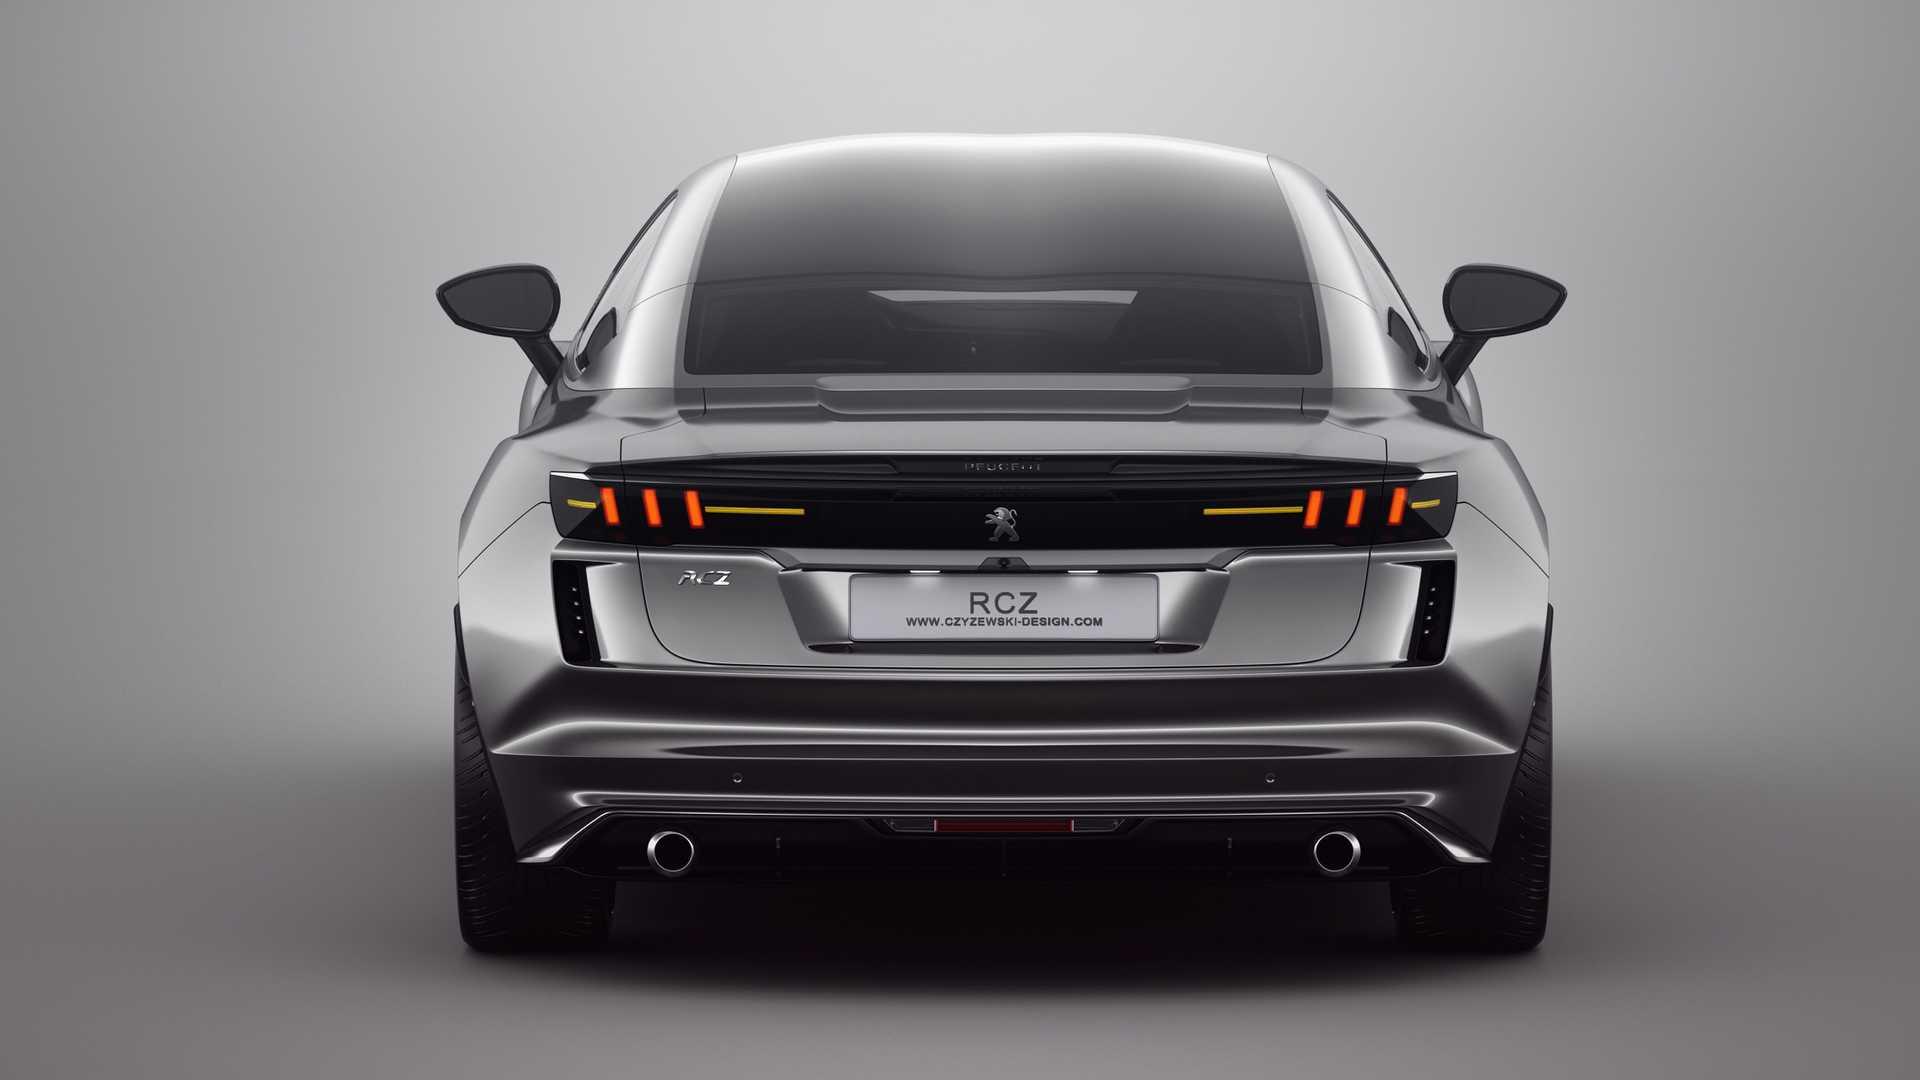 Nový Peugeot RCZ